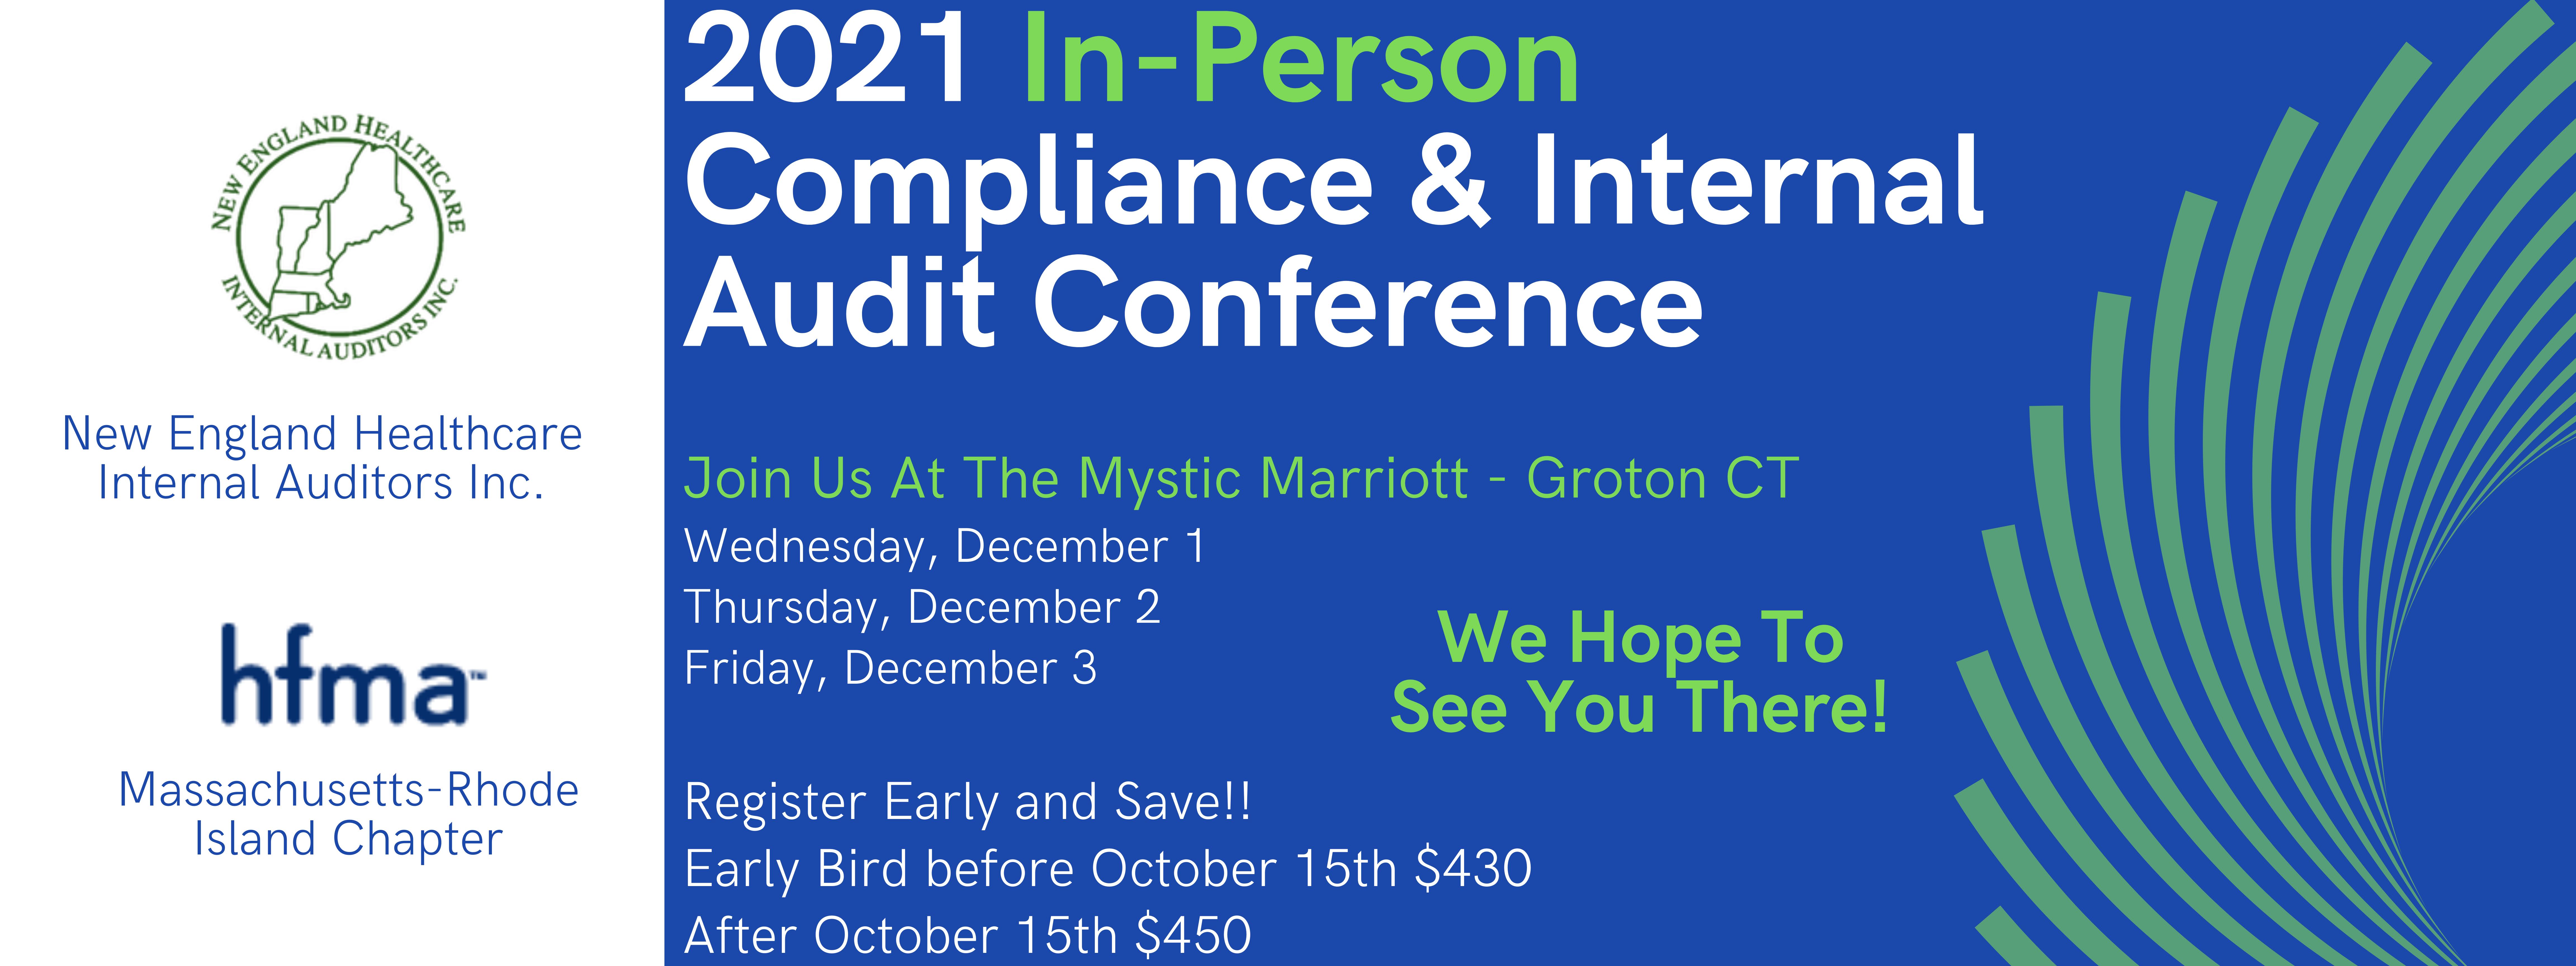 HFMA MA-RI & NEHIA Joint Compliance Conference